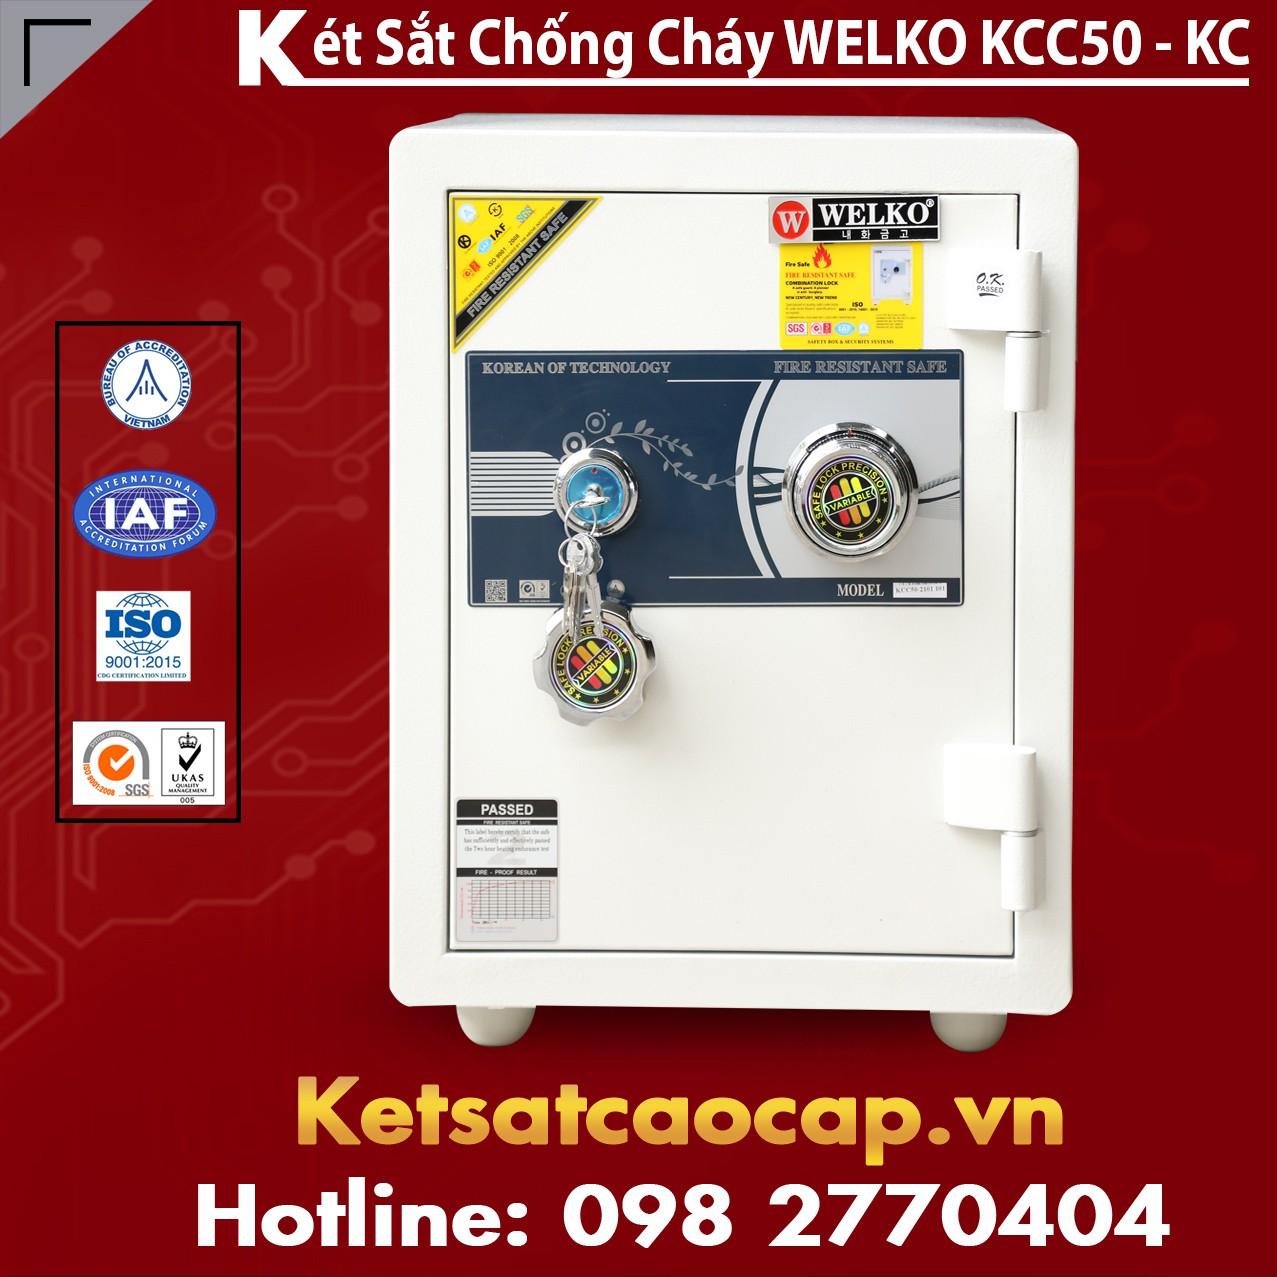 Mua Két Sắt KCC50 White - KC